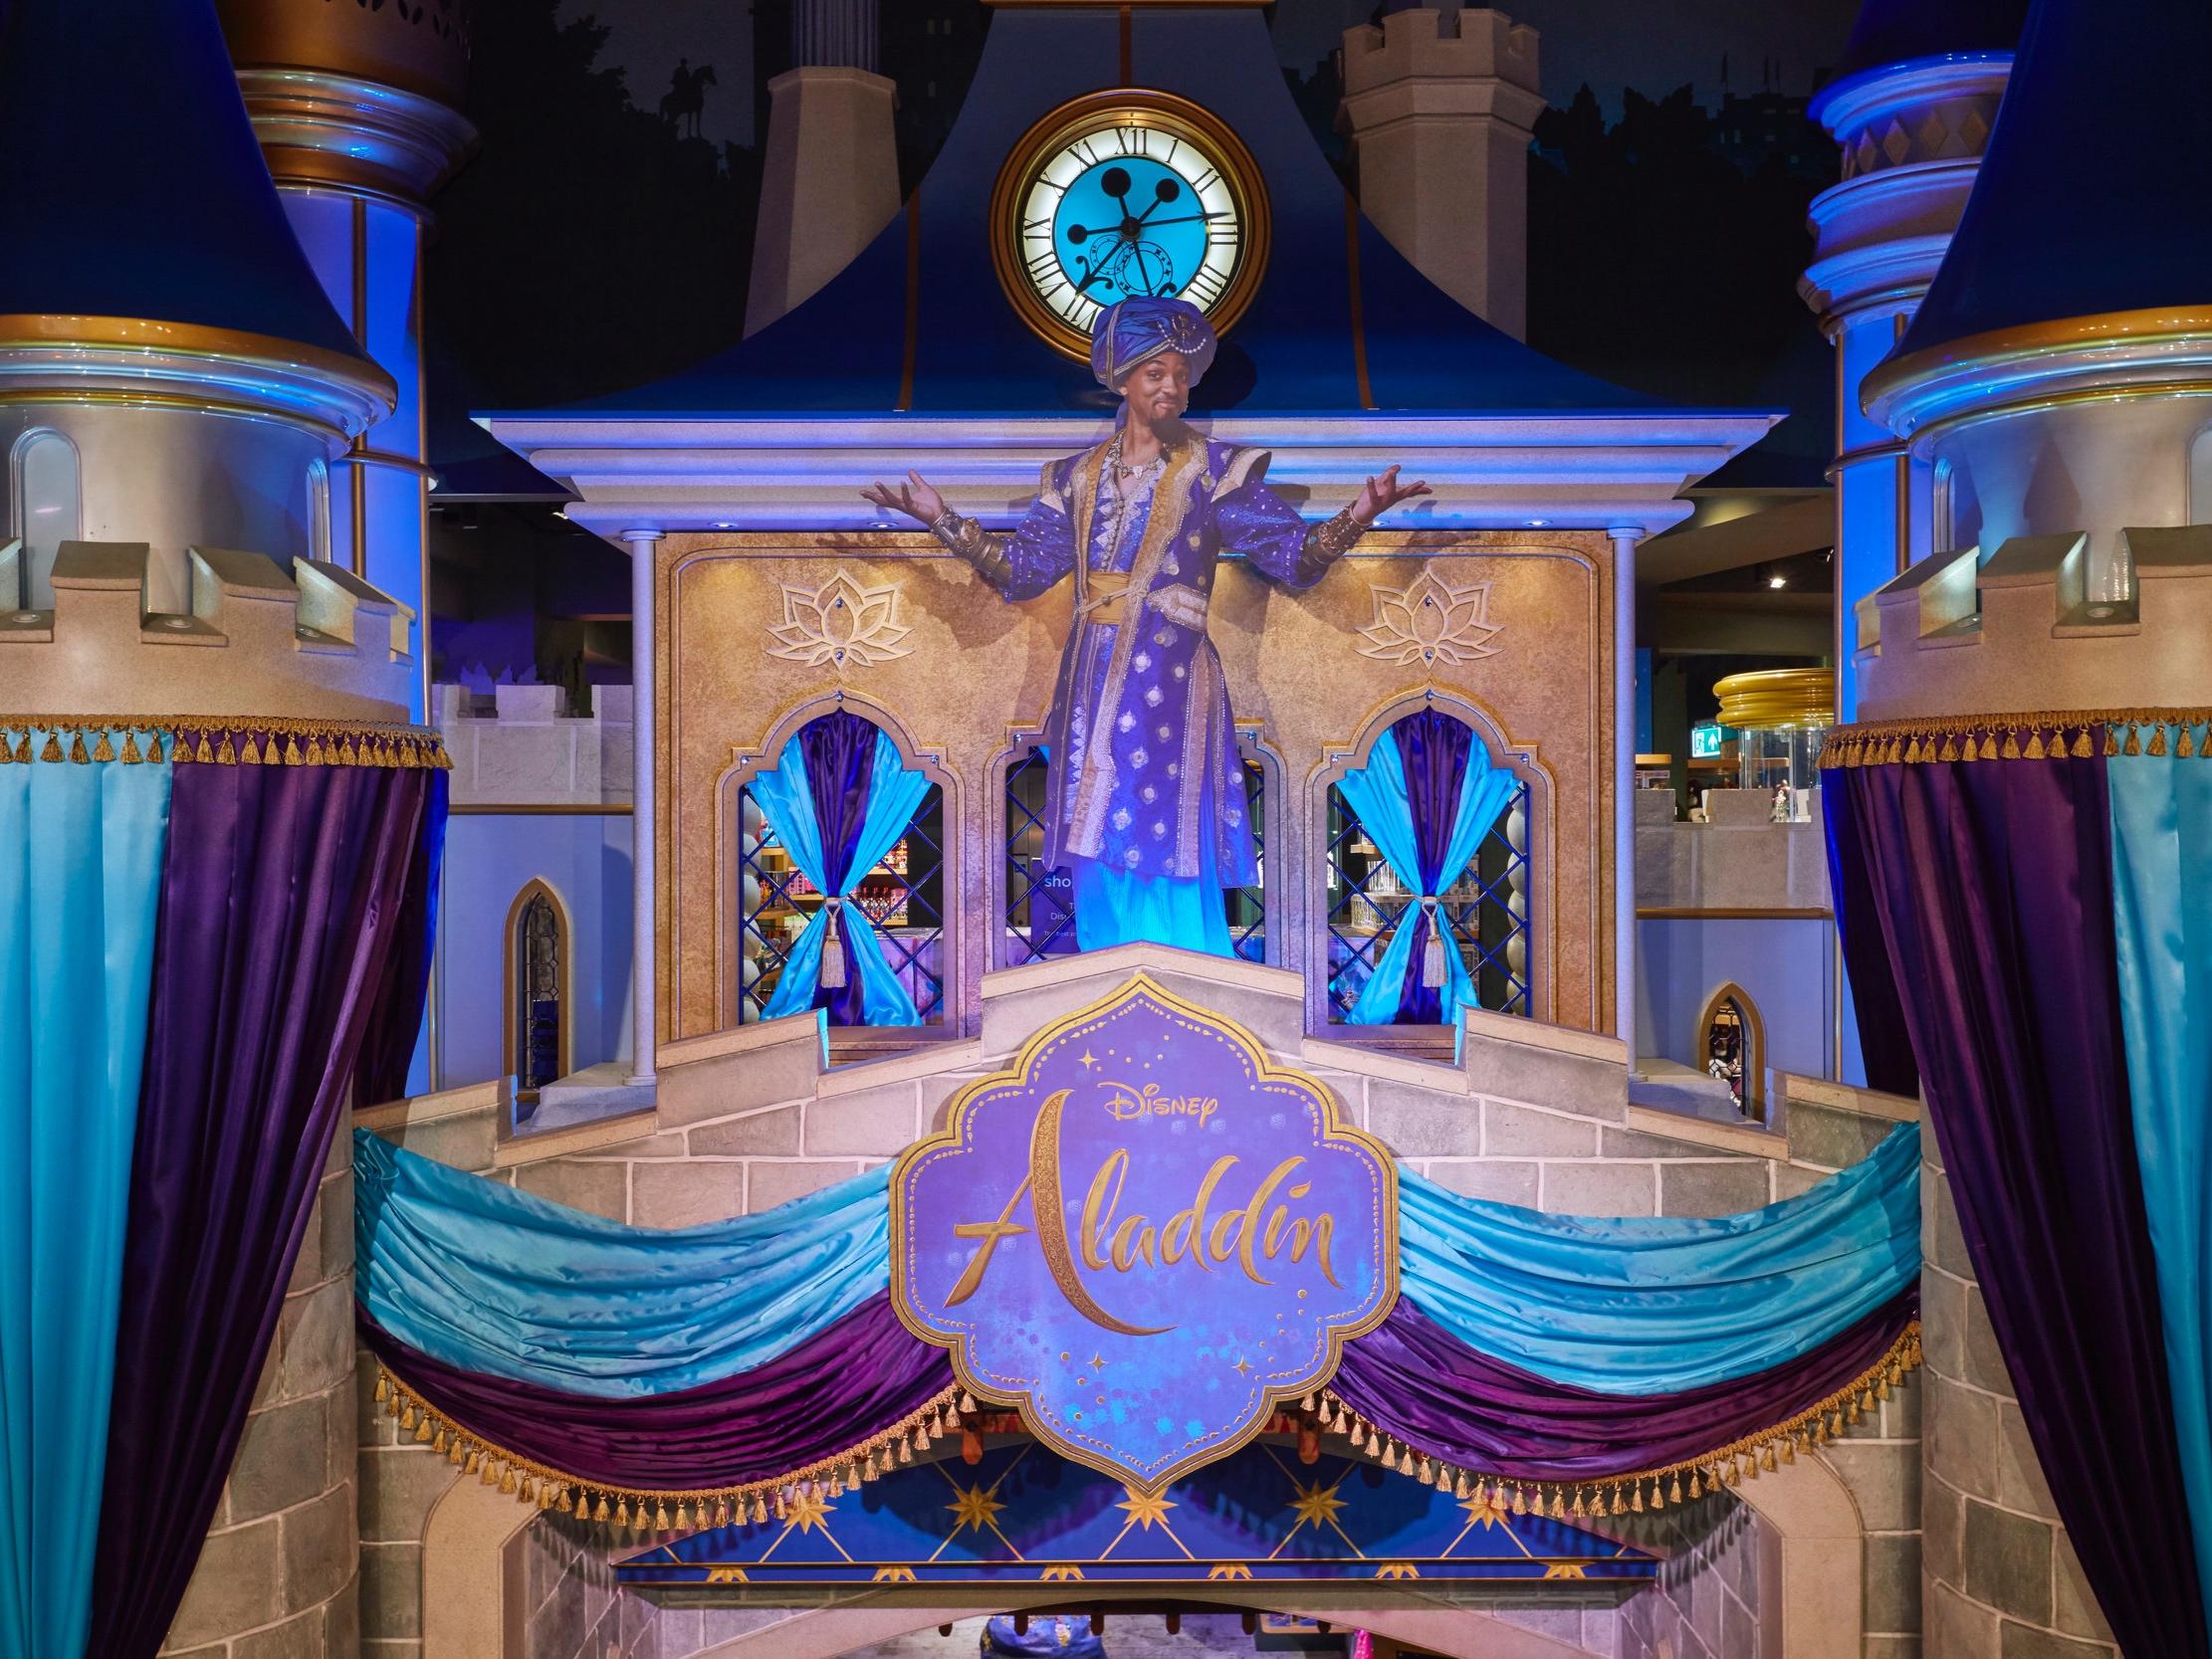 Disney+Castle%2C+Aladdin+decoration.jpg